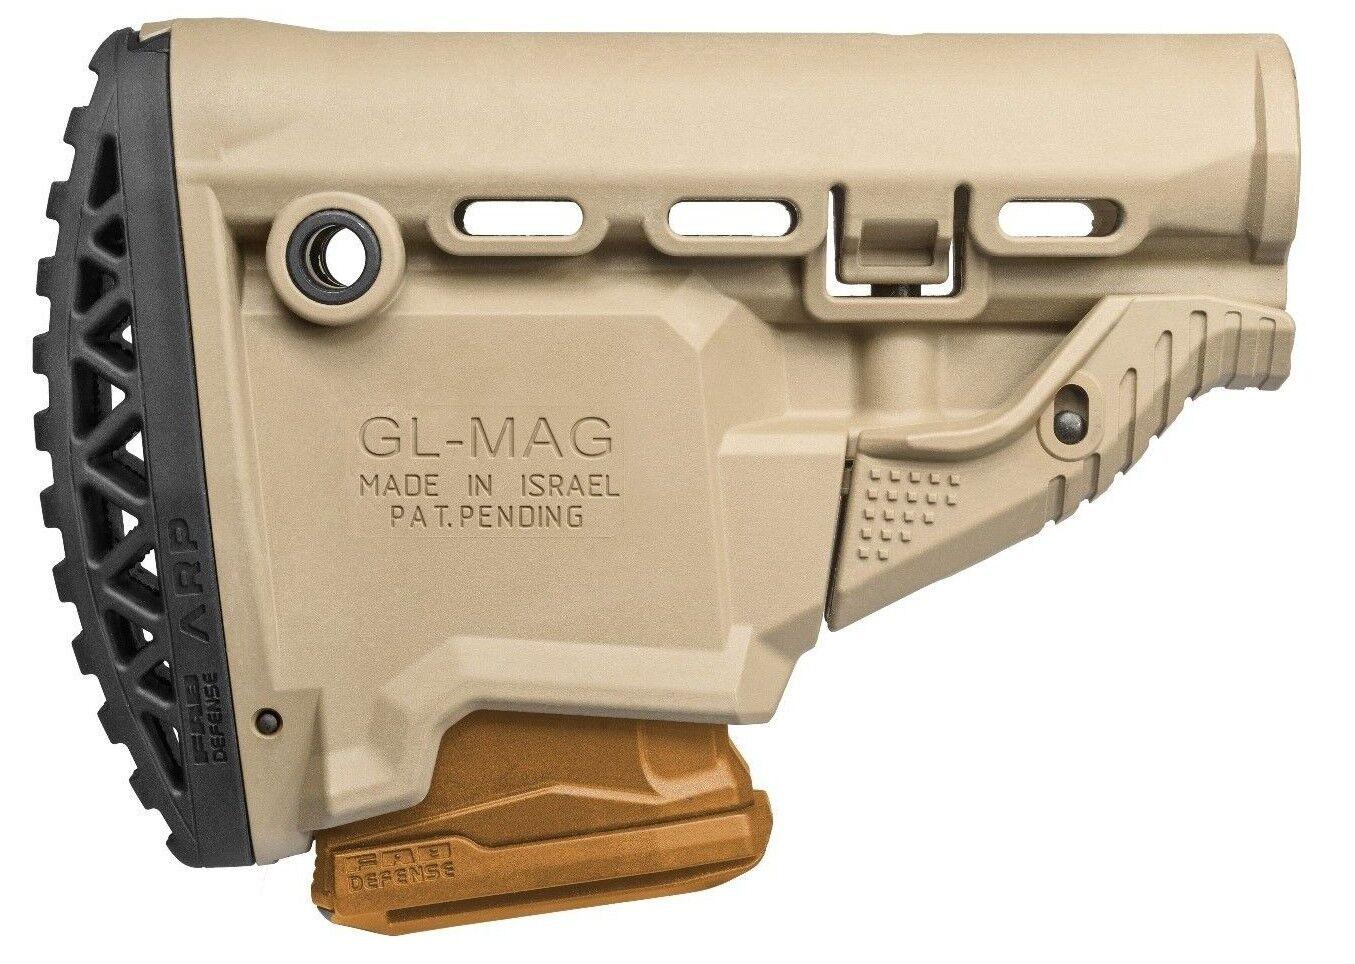 GLMAG-S ARP FAB Defense Desierto Tan Trasero Stock con magazinecarrier IDF